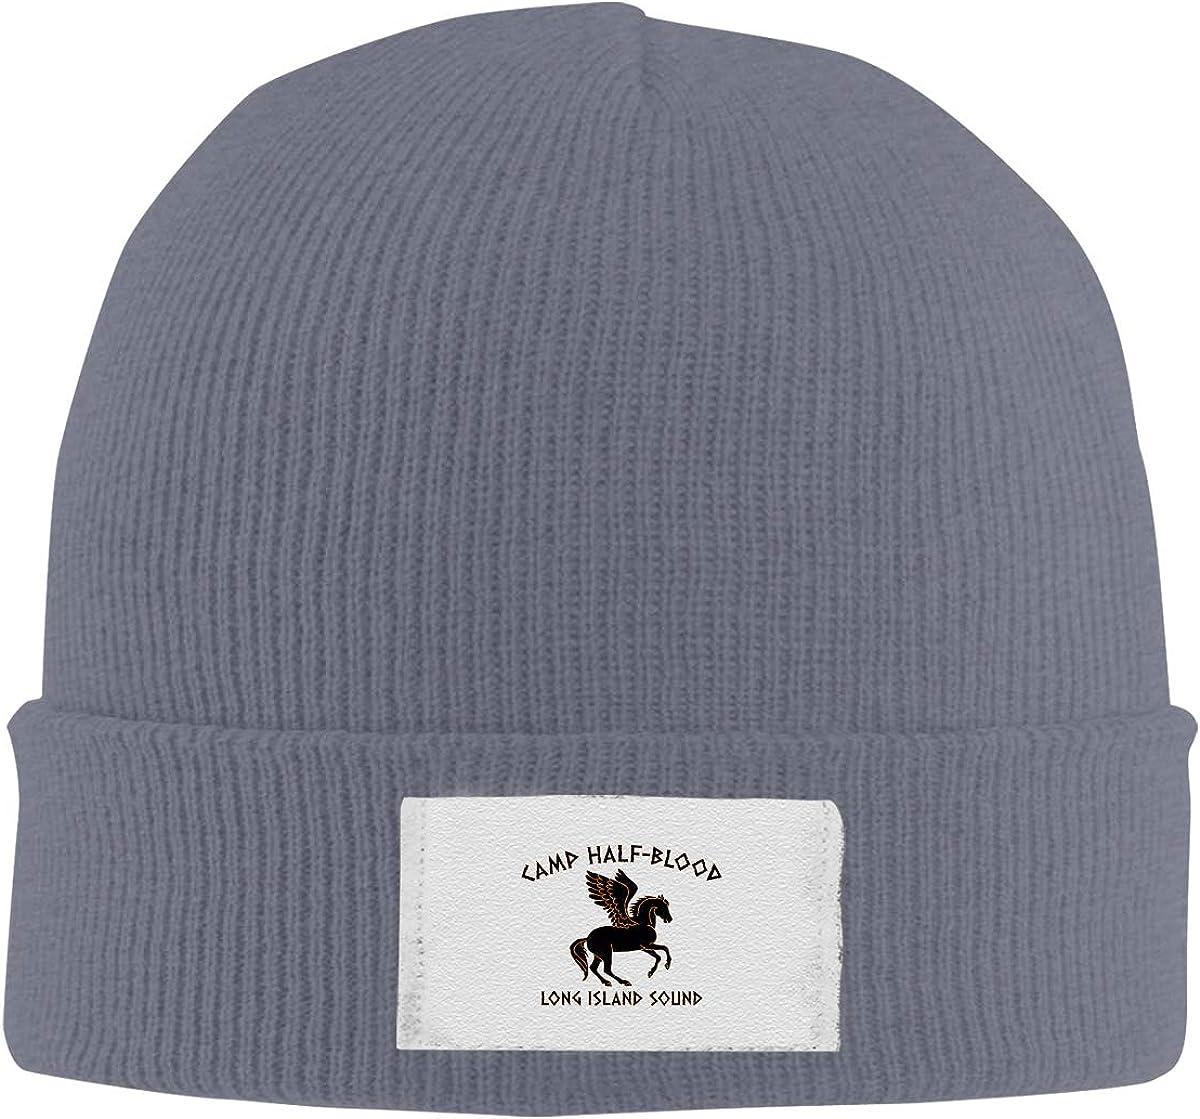 Dunpaiaa Skull Ranking TOP8 Caps Camp Half Blood Hats Stret Knit Large discharge sale Winter Warm